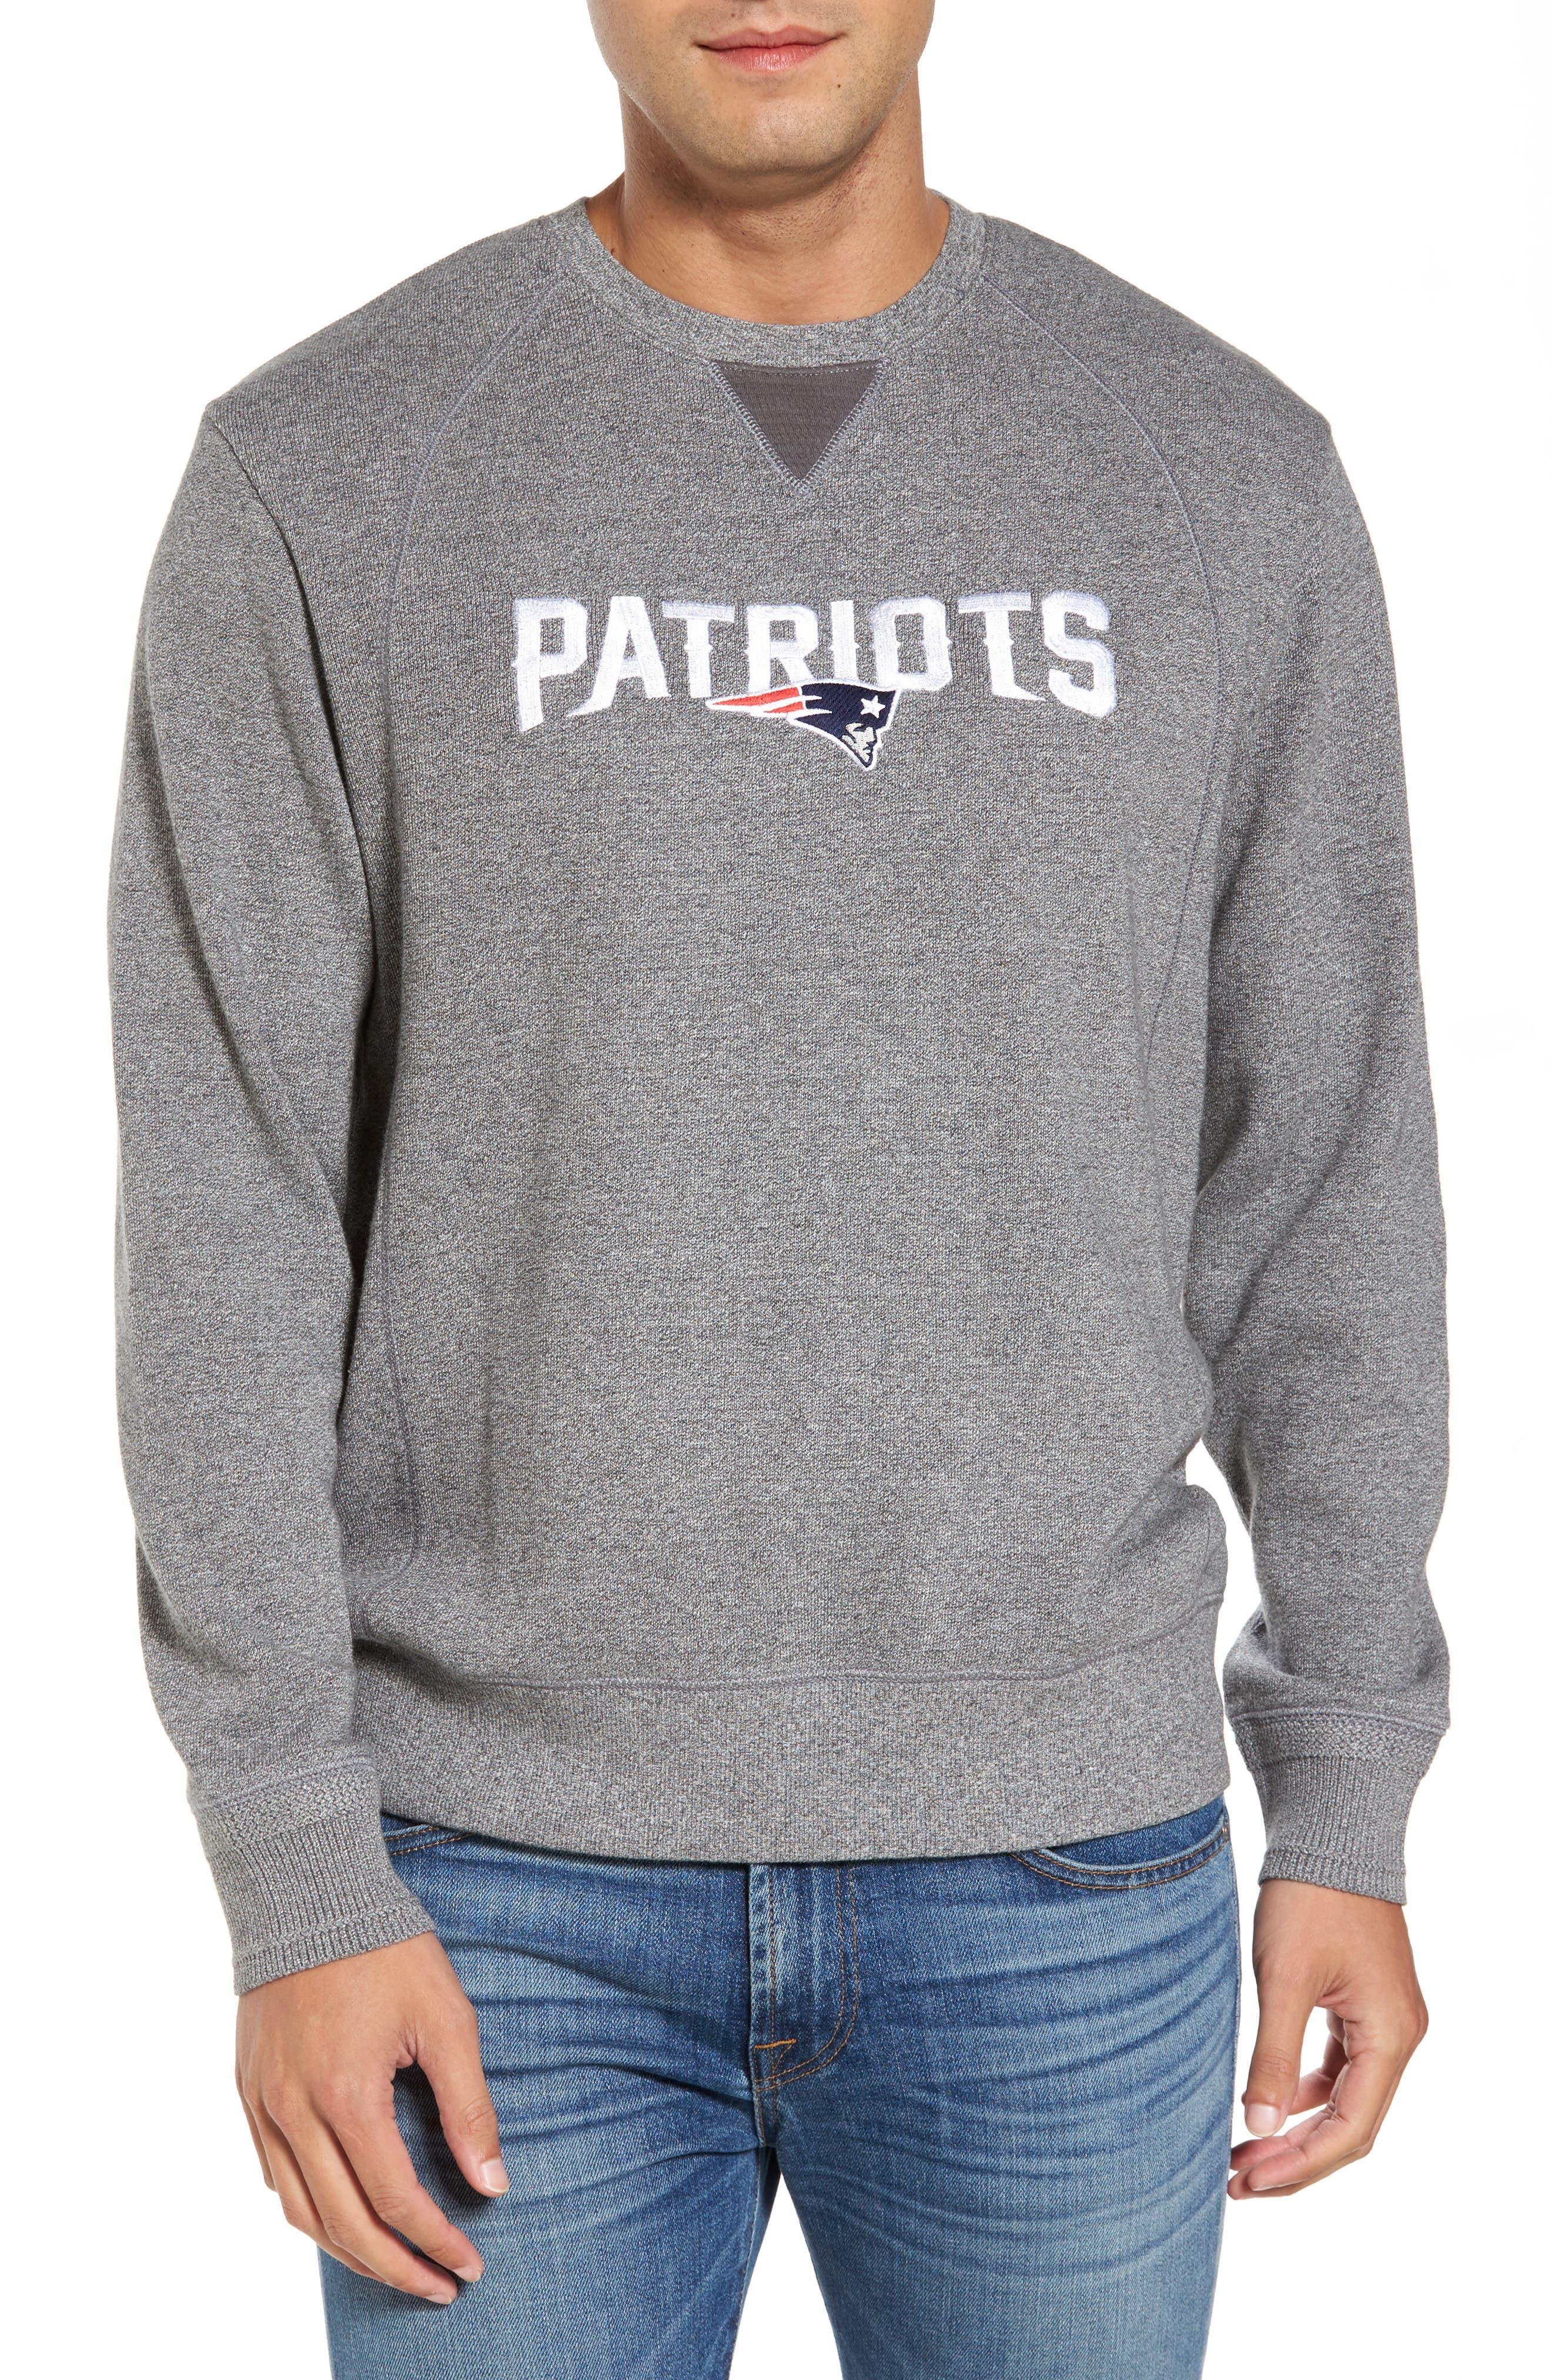 NFL Stitch of Liberty Embroidered Crewneck Sweatshirt,                             Main thumbnail 22, color,